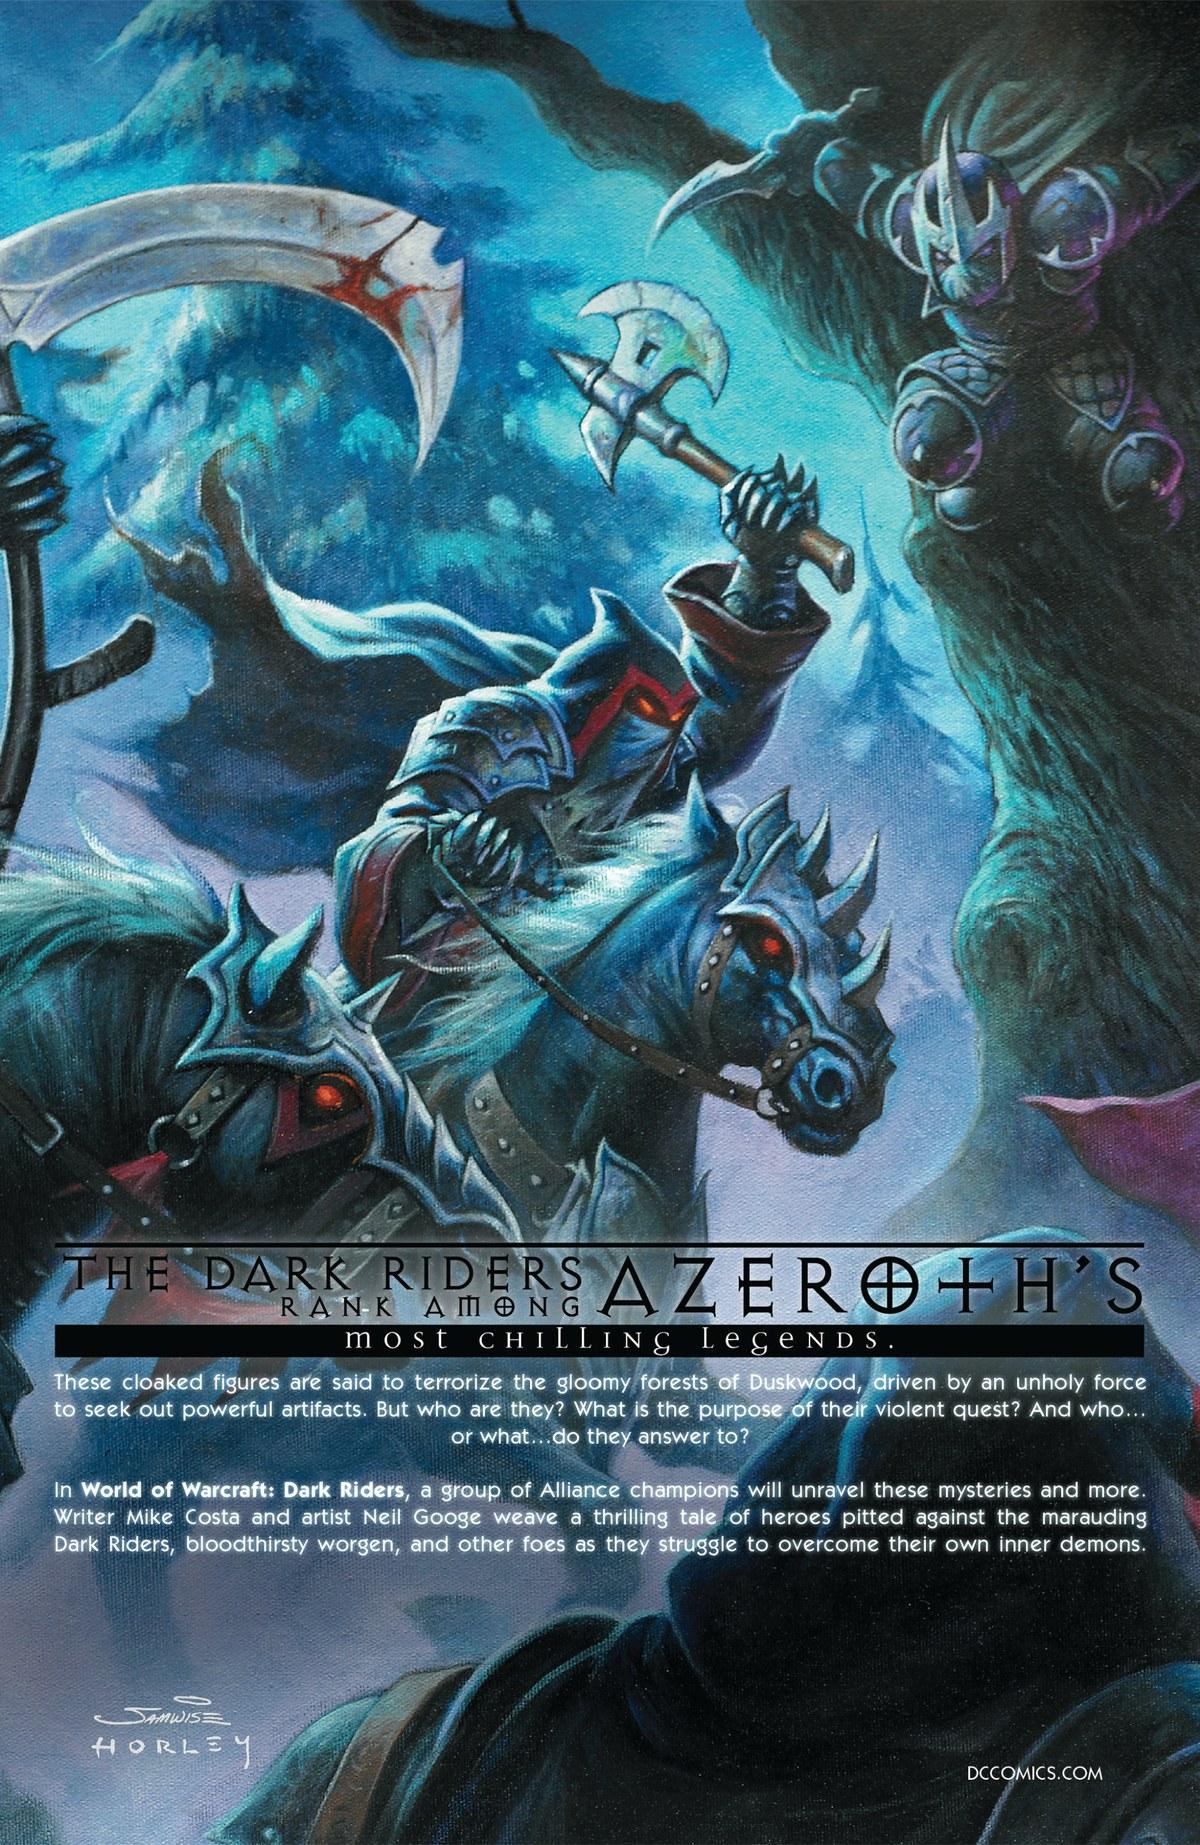 Read online World of Warcraft: Dark Riders comic -  Issue # Full - 142